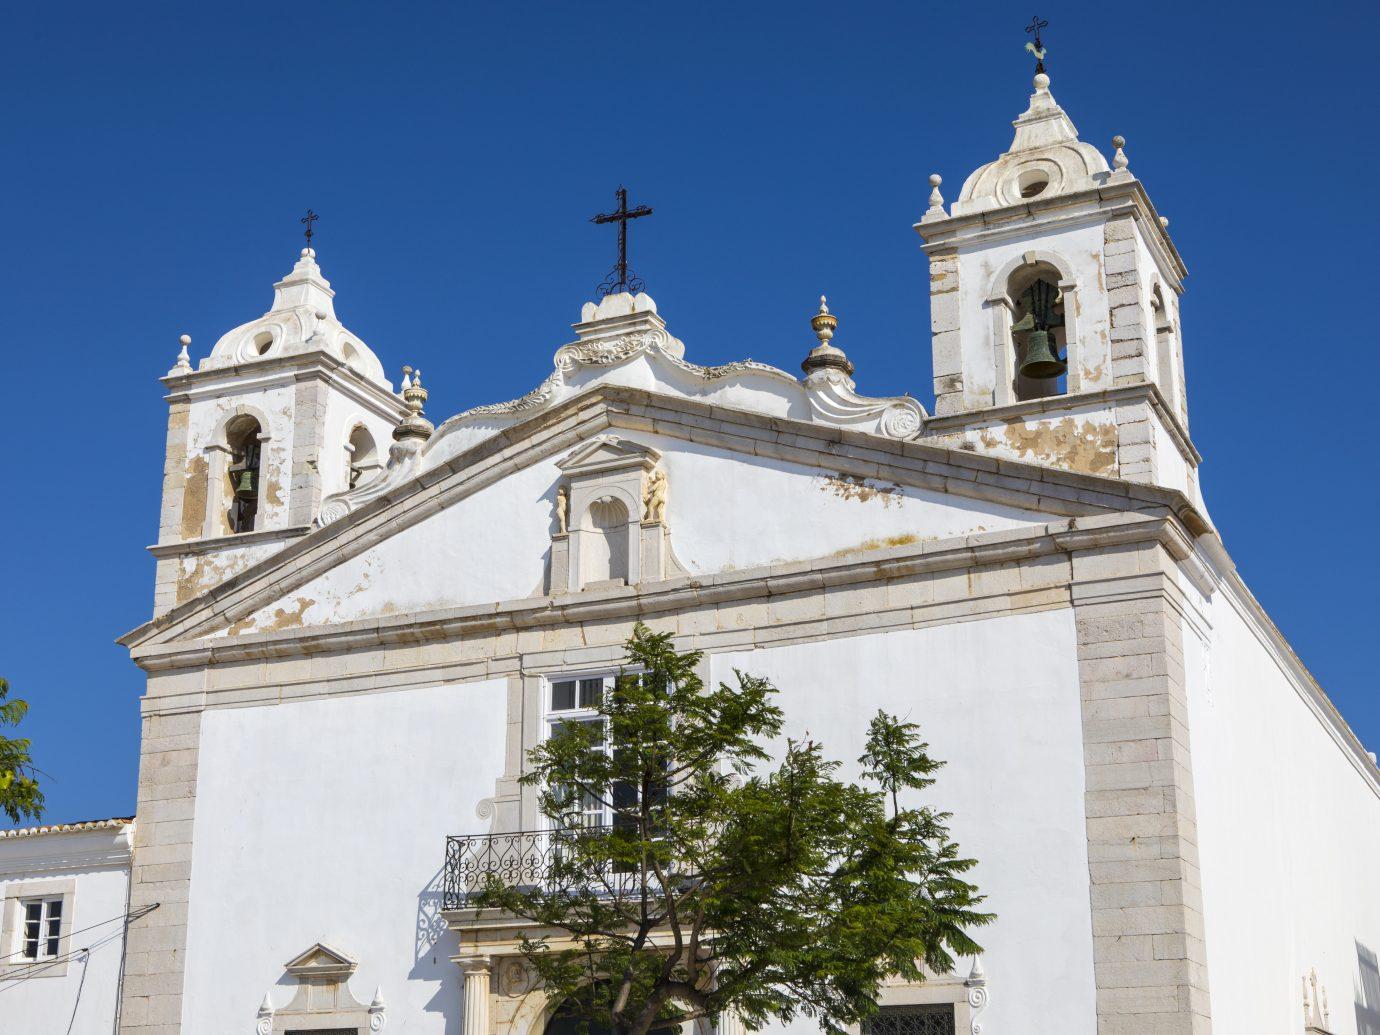 The exterior of Igreja de Santa Maria, or Church of Santa Maria, in the historic old town of Lagos in Portugal.